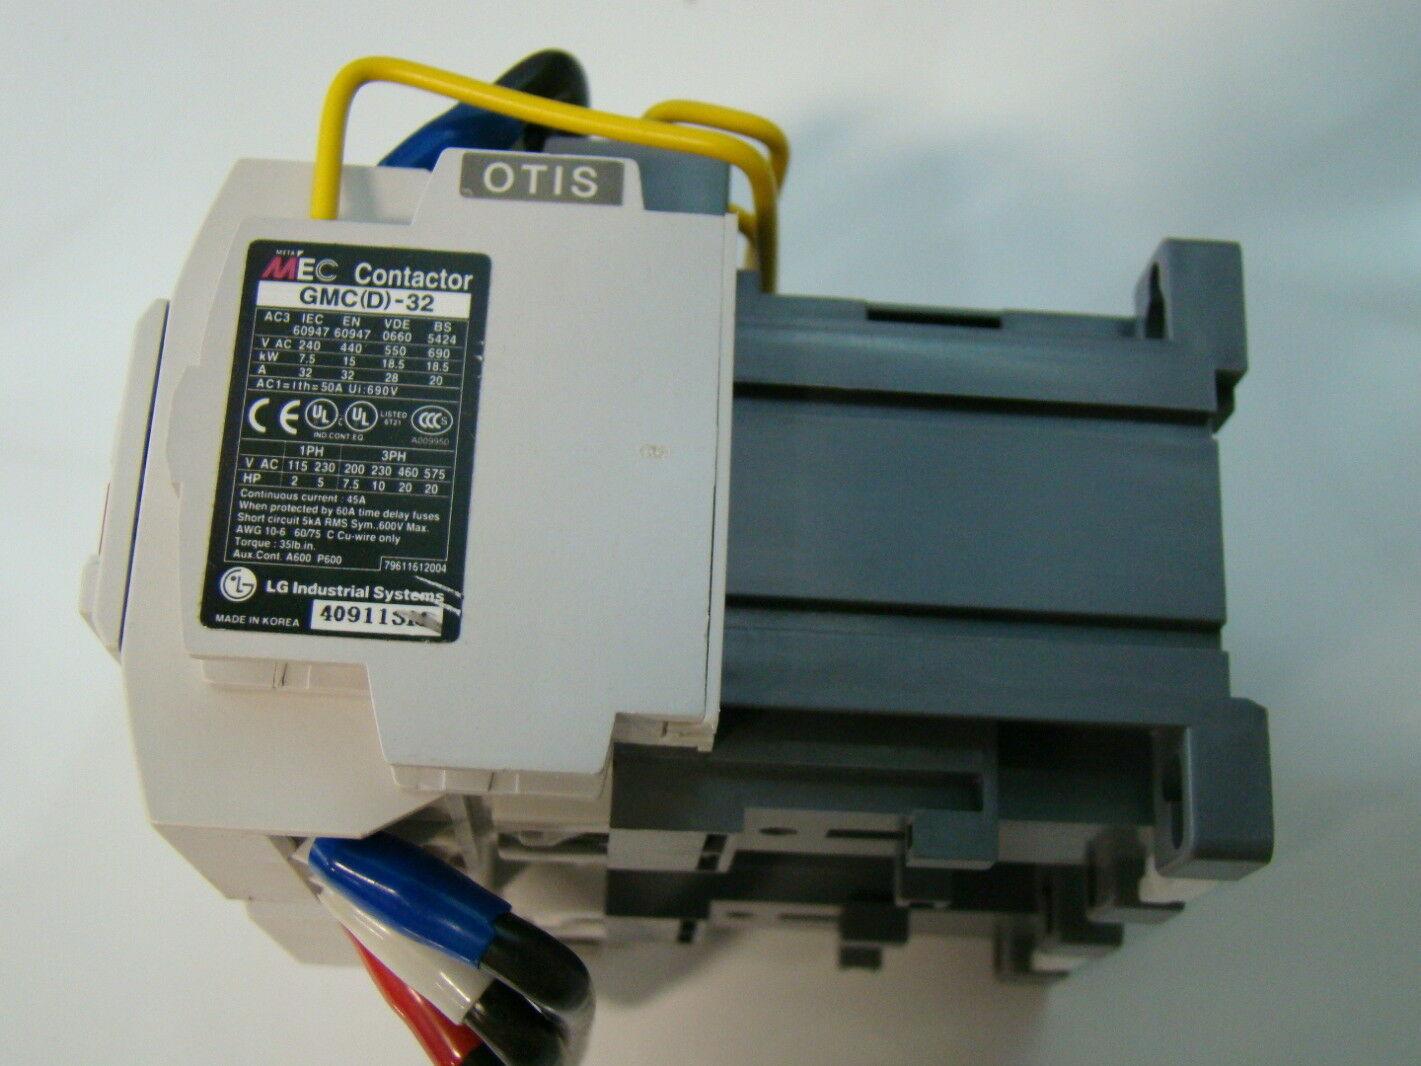 Meta Mec LG 48VDC Magnetic Contactor GMC(D) 32 eBay #6C6243